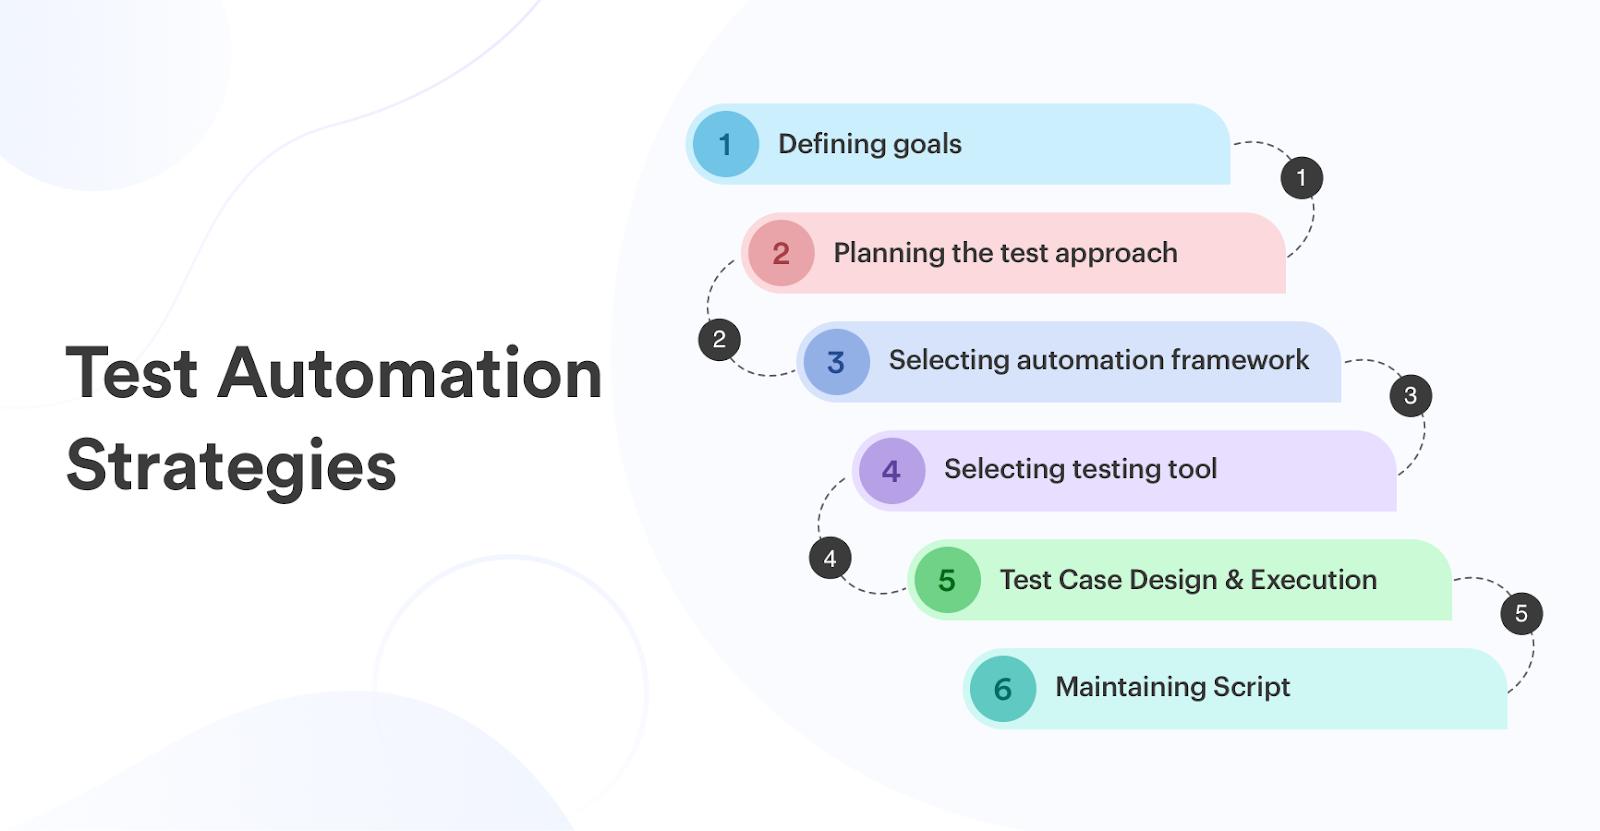 test-automation-strategies